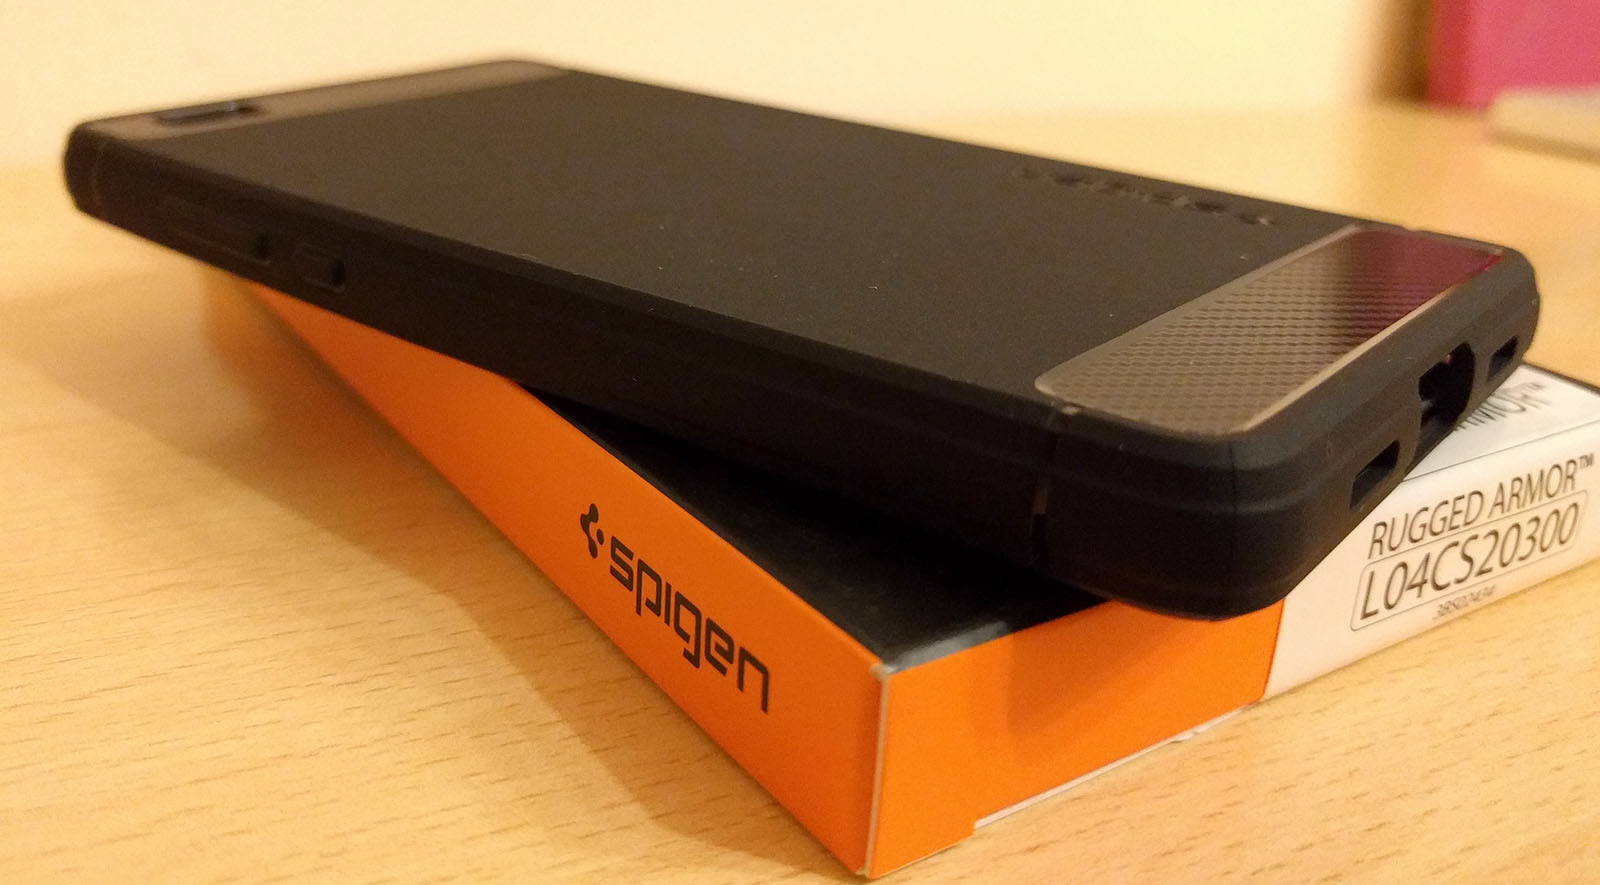 Proviamo la cover Spigen Per Huawei P8 Lite